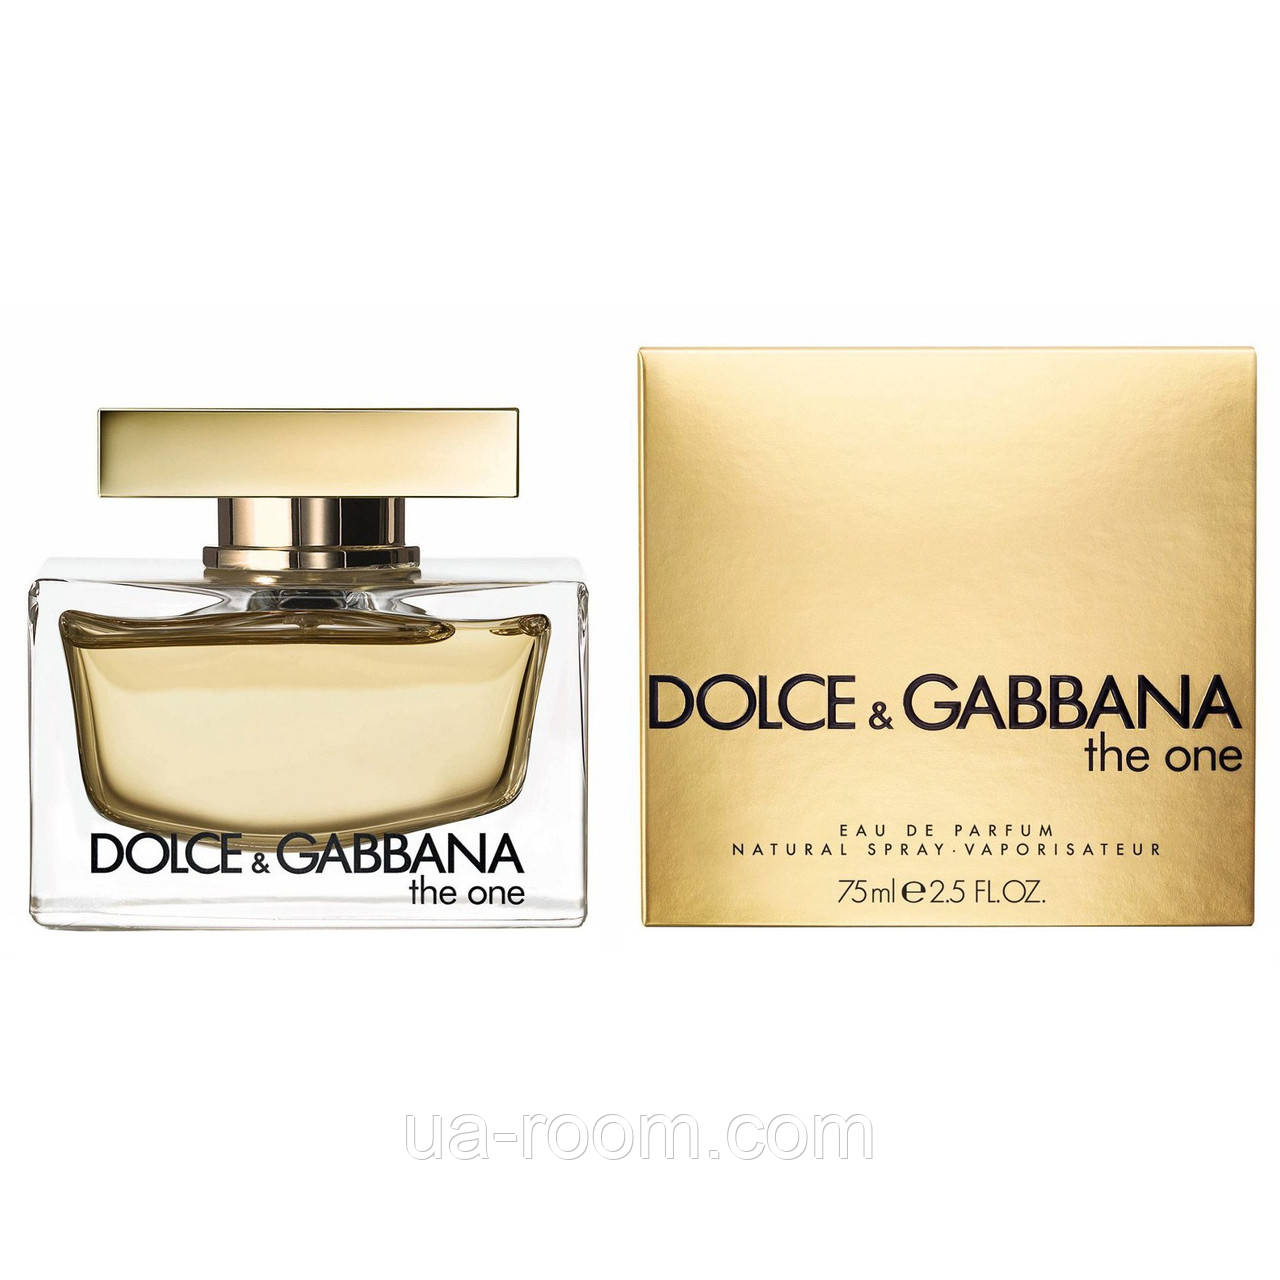 Dolce&Gabbana The one, женская парфюмированная вода 75 мл.